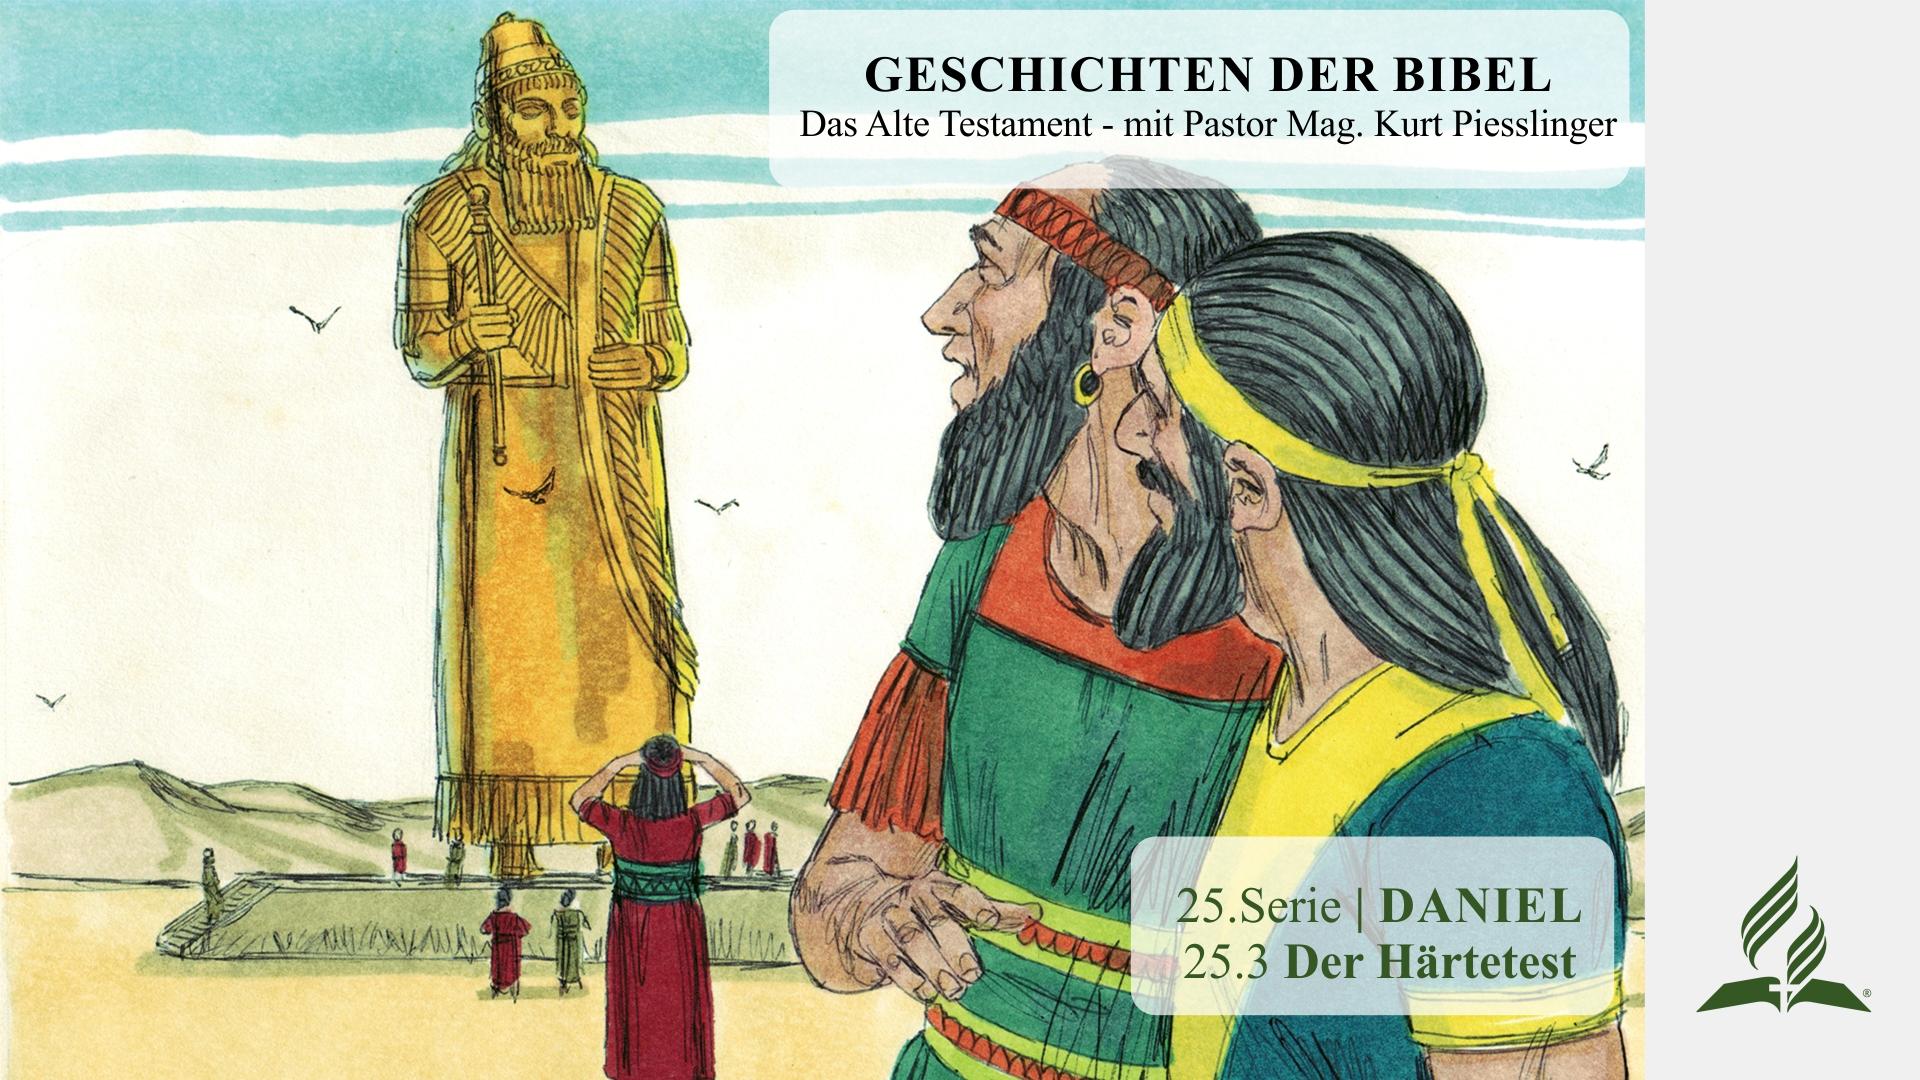 GESCHICHTEN DER BIBEL: 25.3 Der Härtetest – 25.DANIEL | Pastor Mag. Kurt Piesslinger